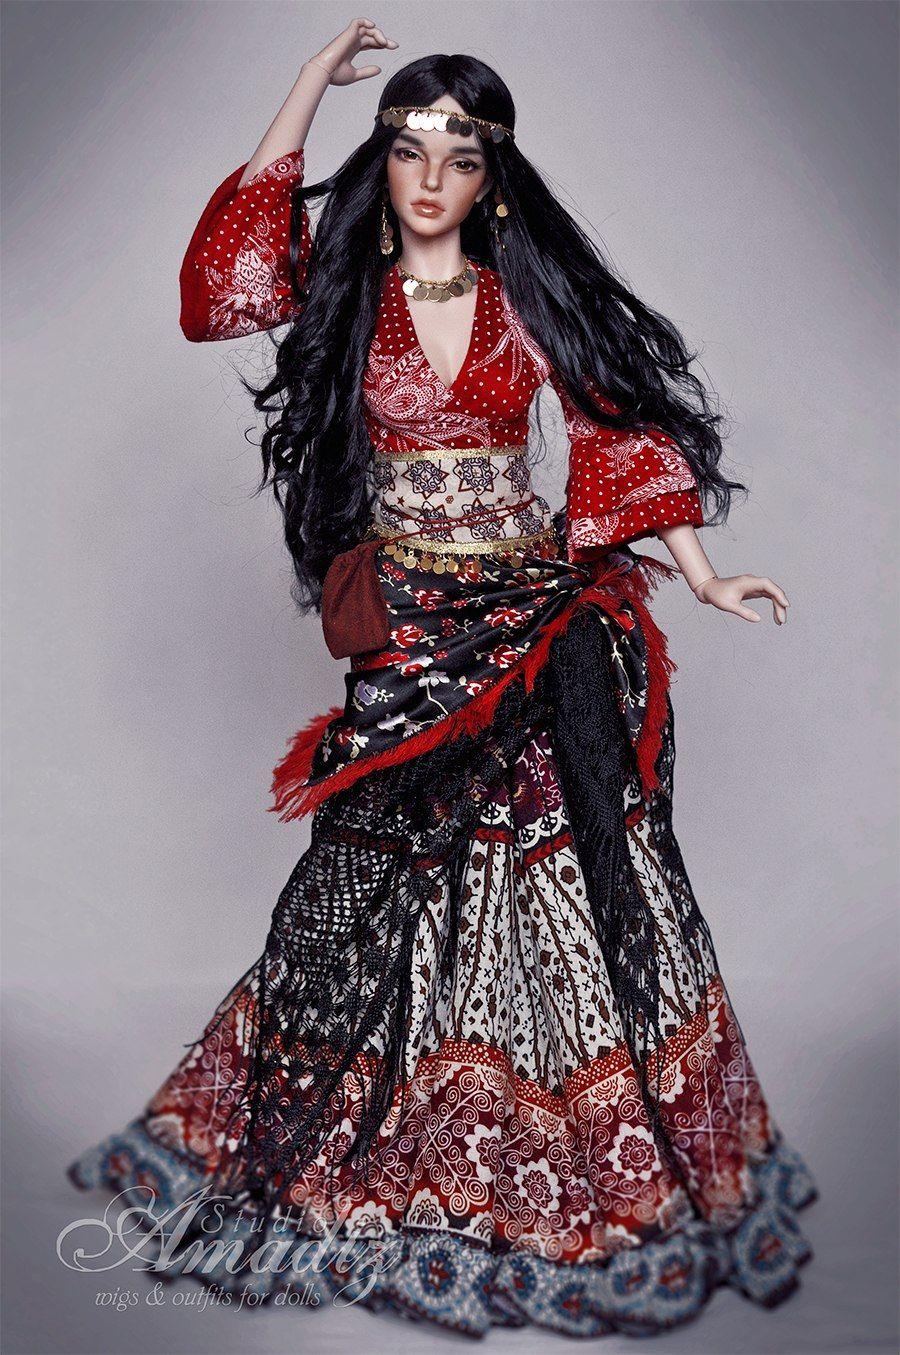 Amadiz Studio куклы Bjd парики и одежда 39 S Photos 7 Albums Vk цыганская одежда цыганская мода цыганки